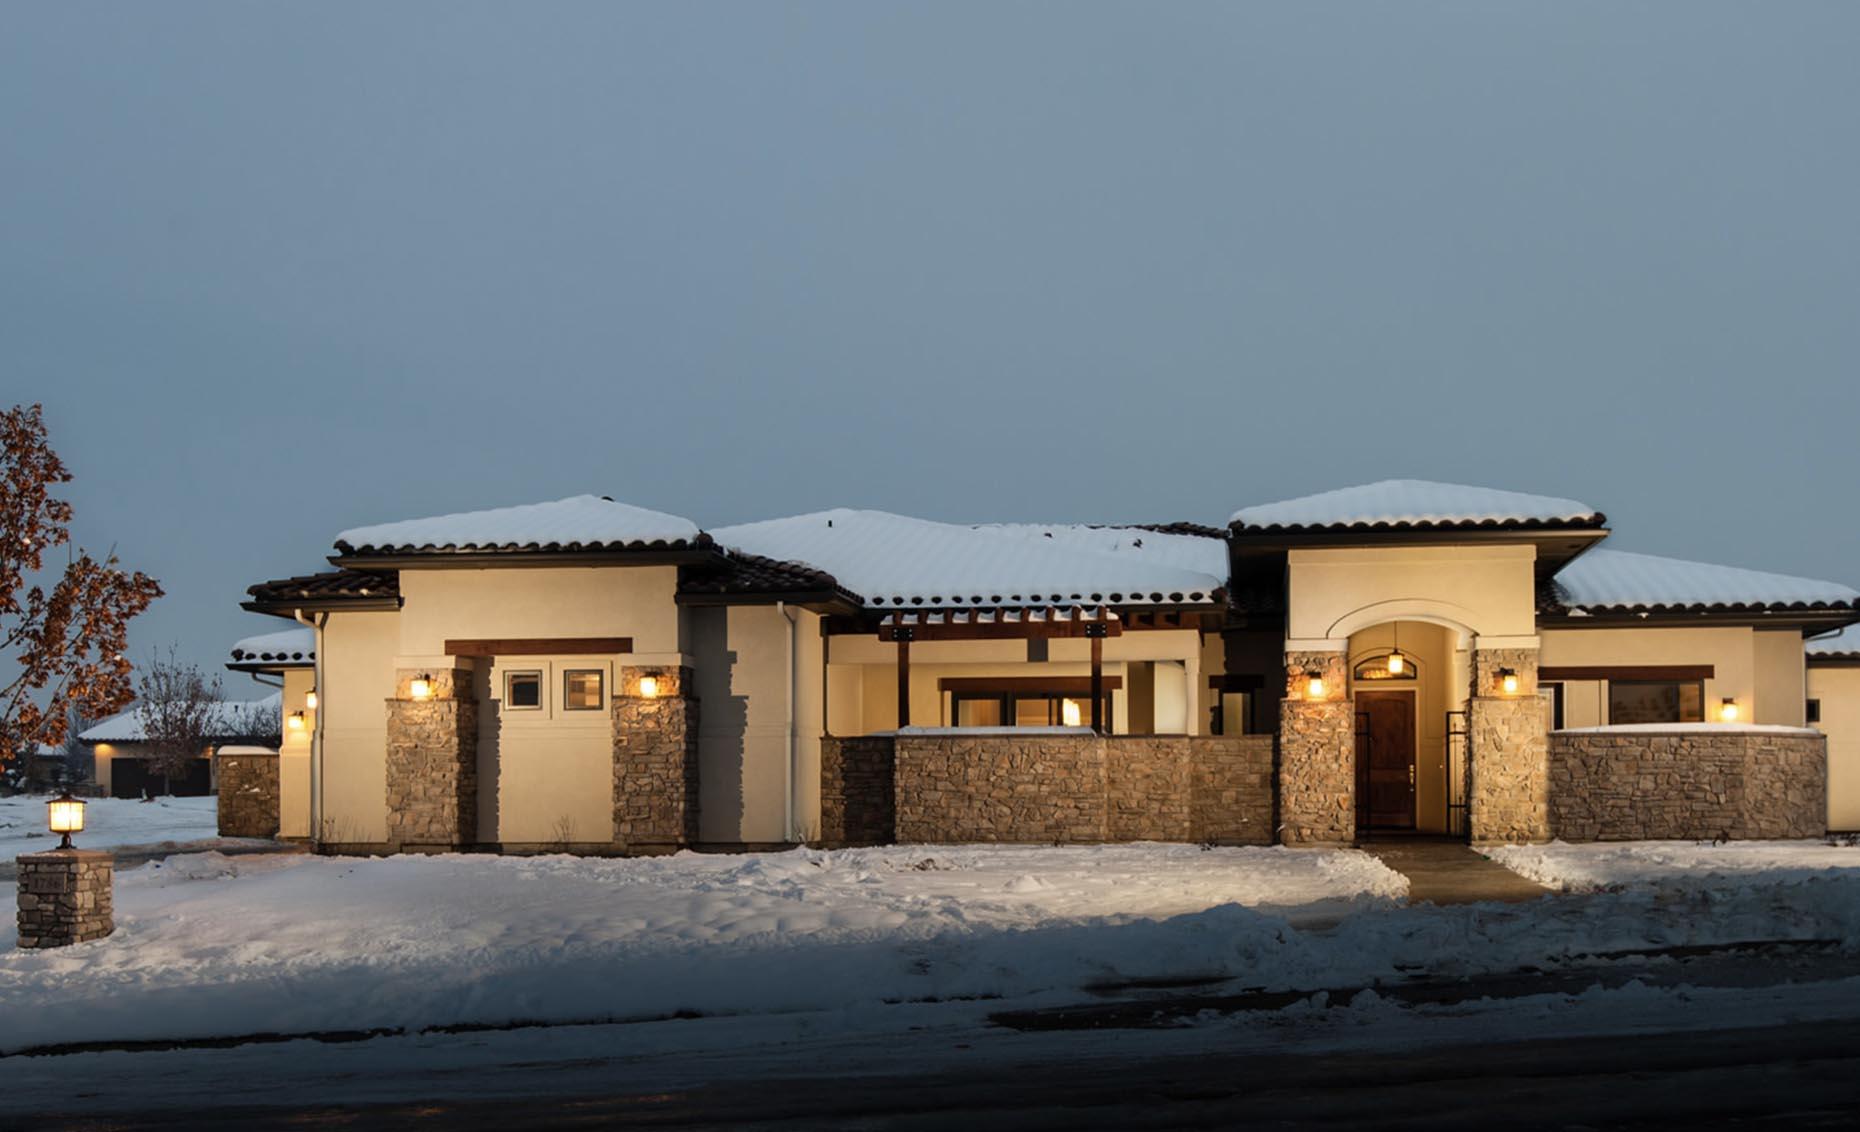 The Corrente Bello House Exterior on a Snowy Evening